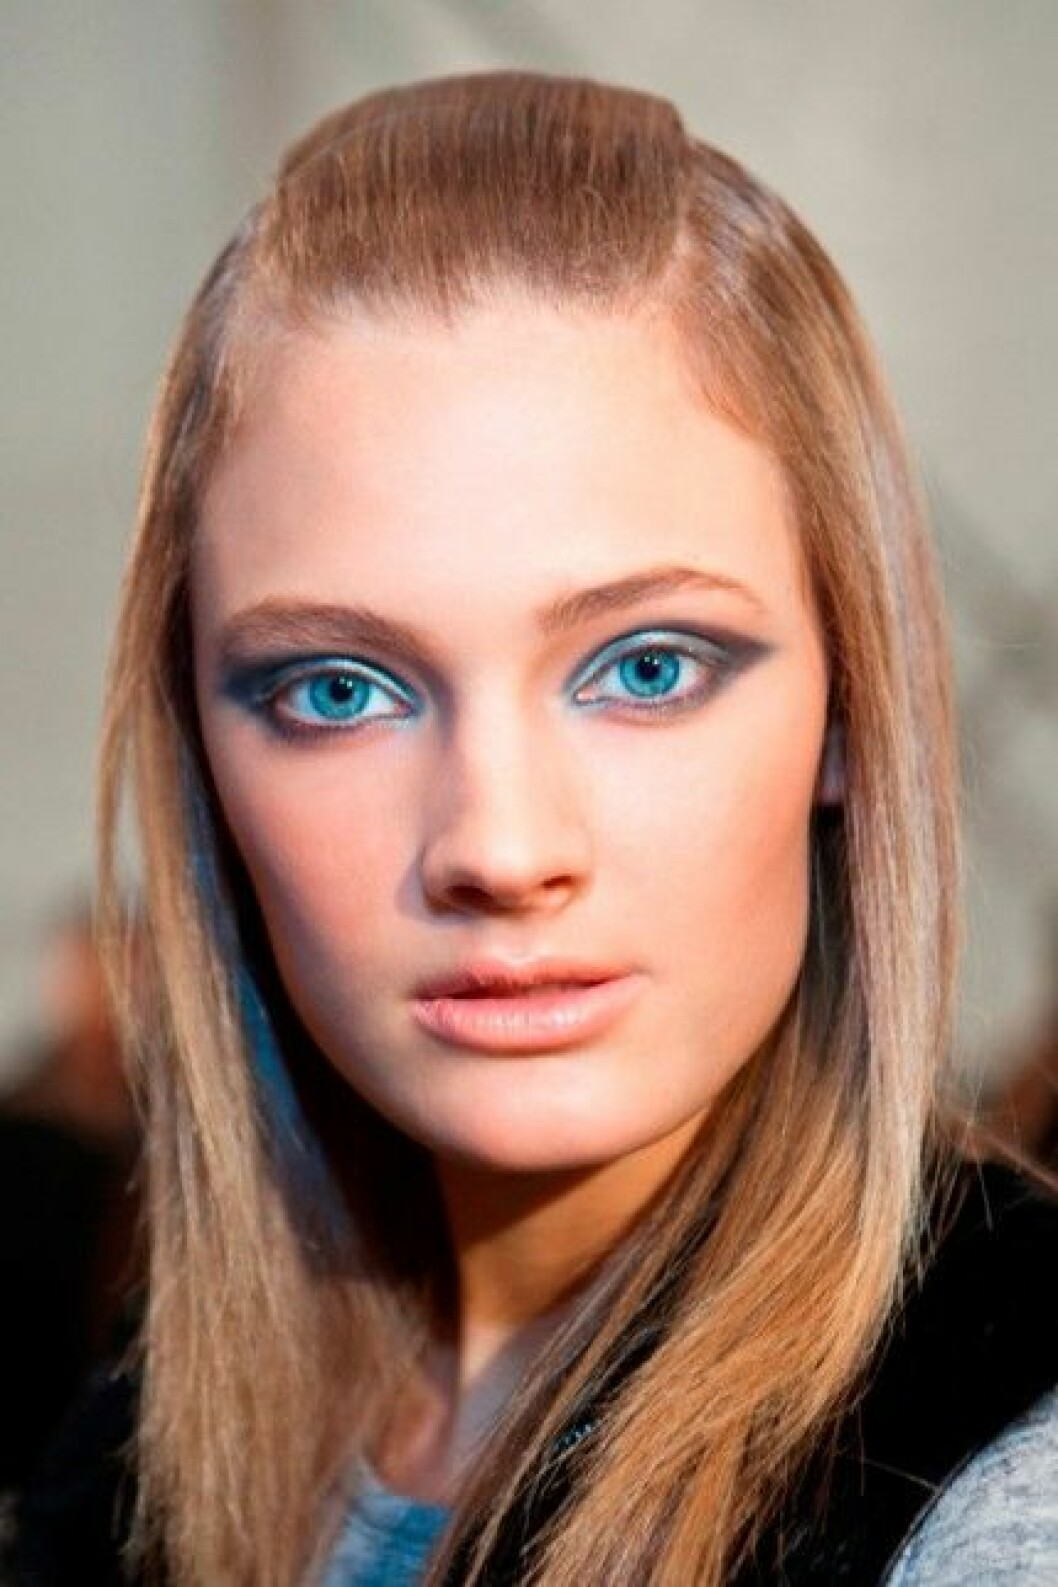 Modellen Constance Jablonski för Derek Lam, A/W 2011.